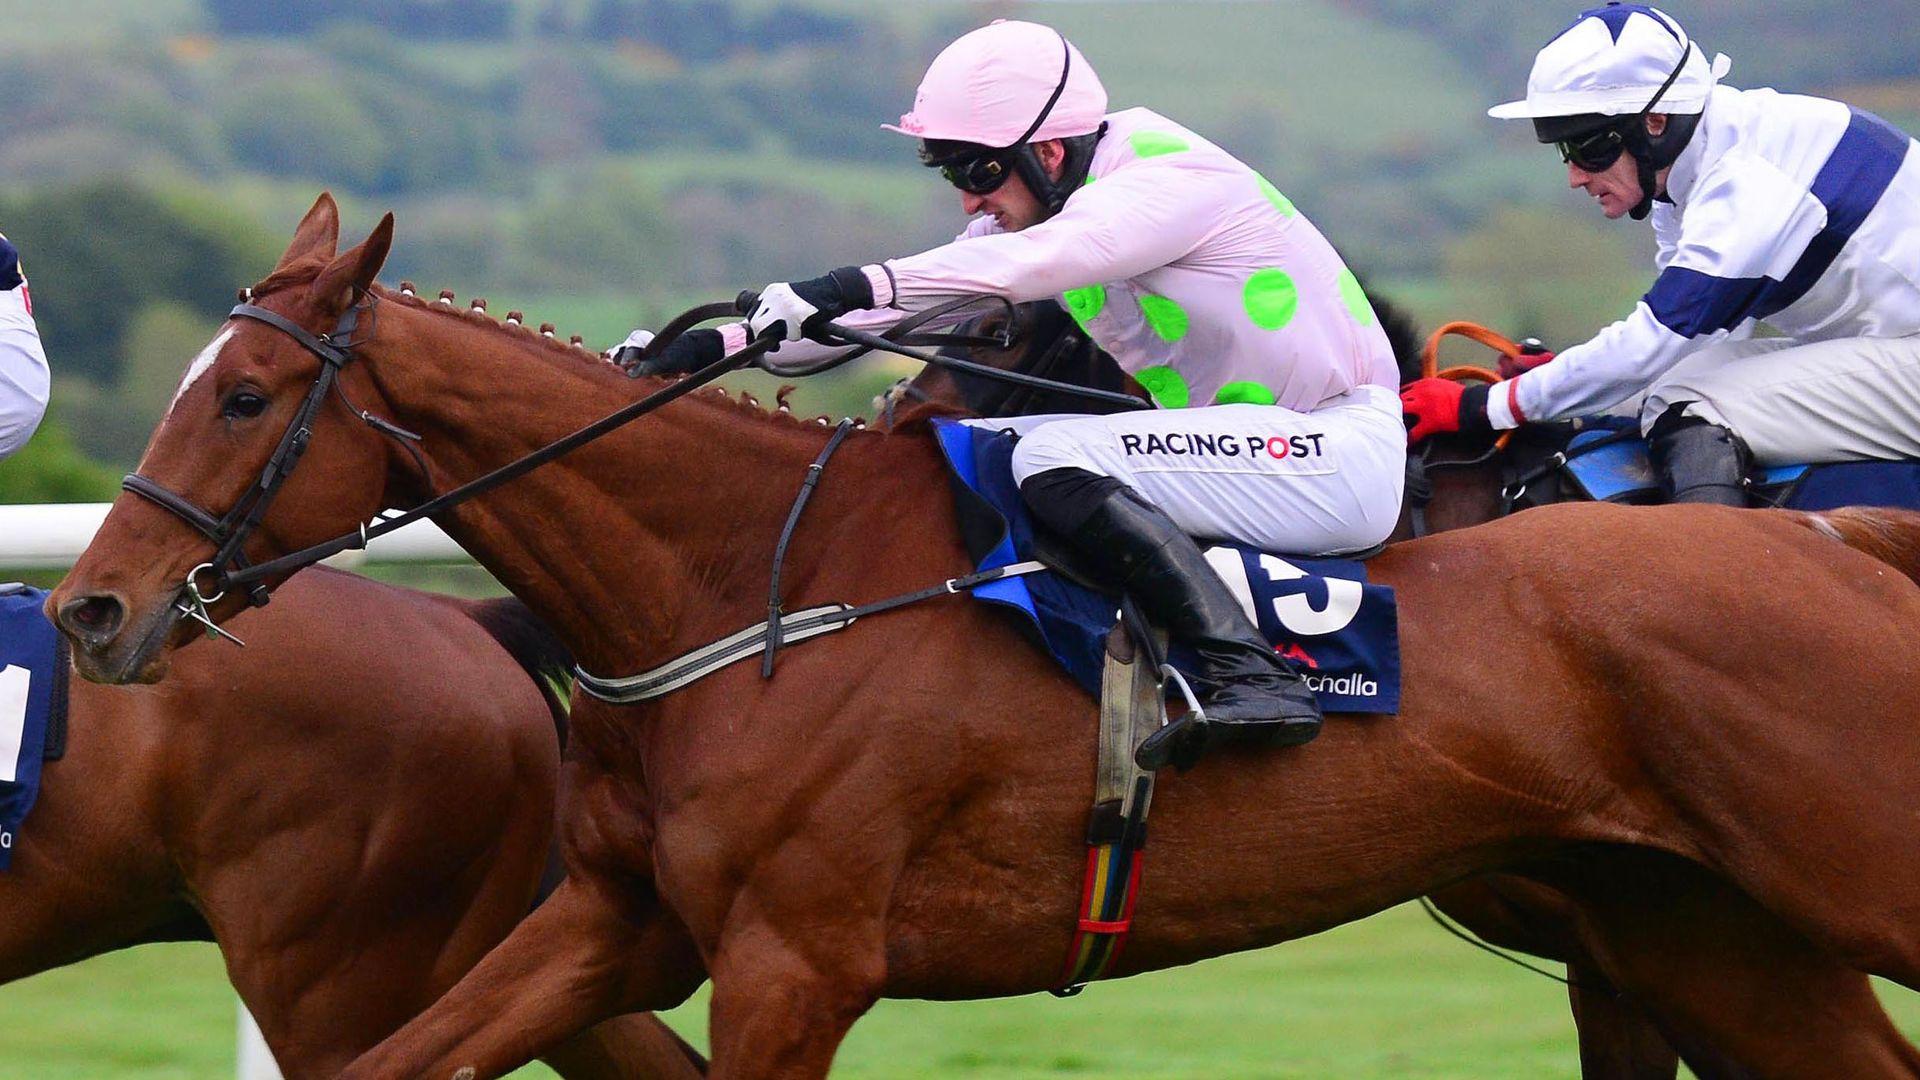 Patrick Mullins misses Cheltenham - sky sports